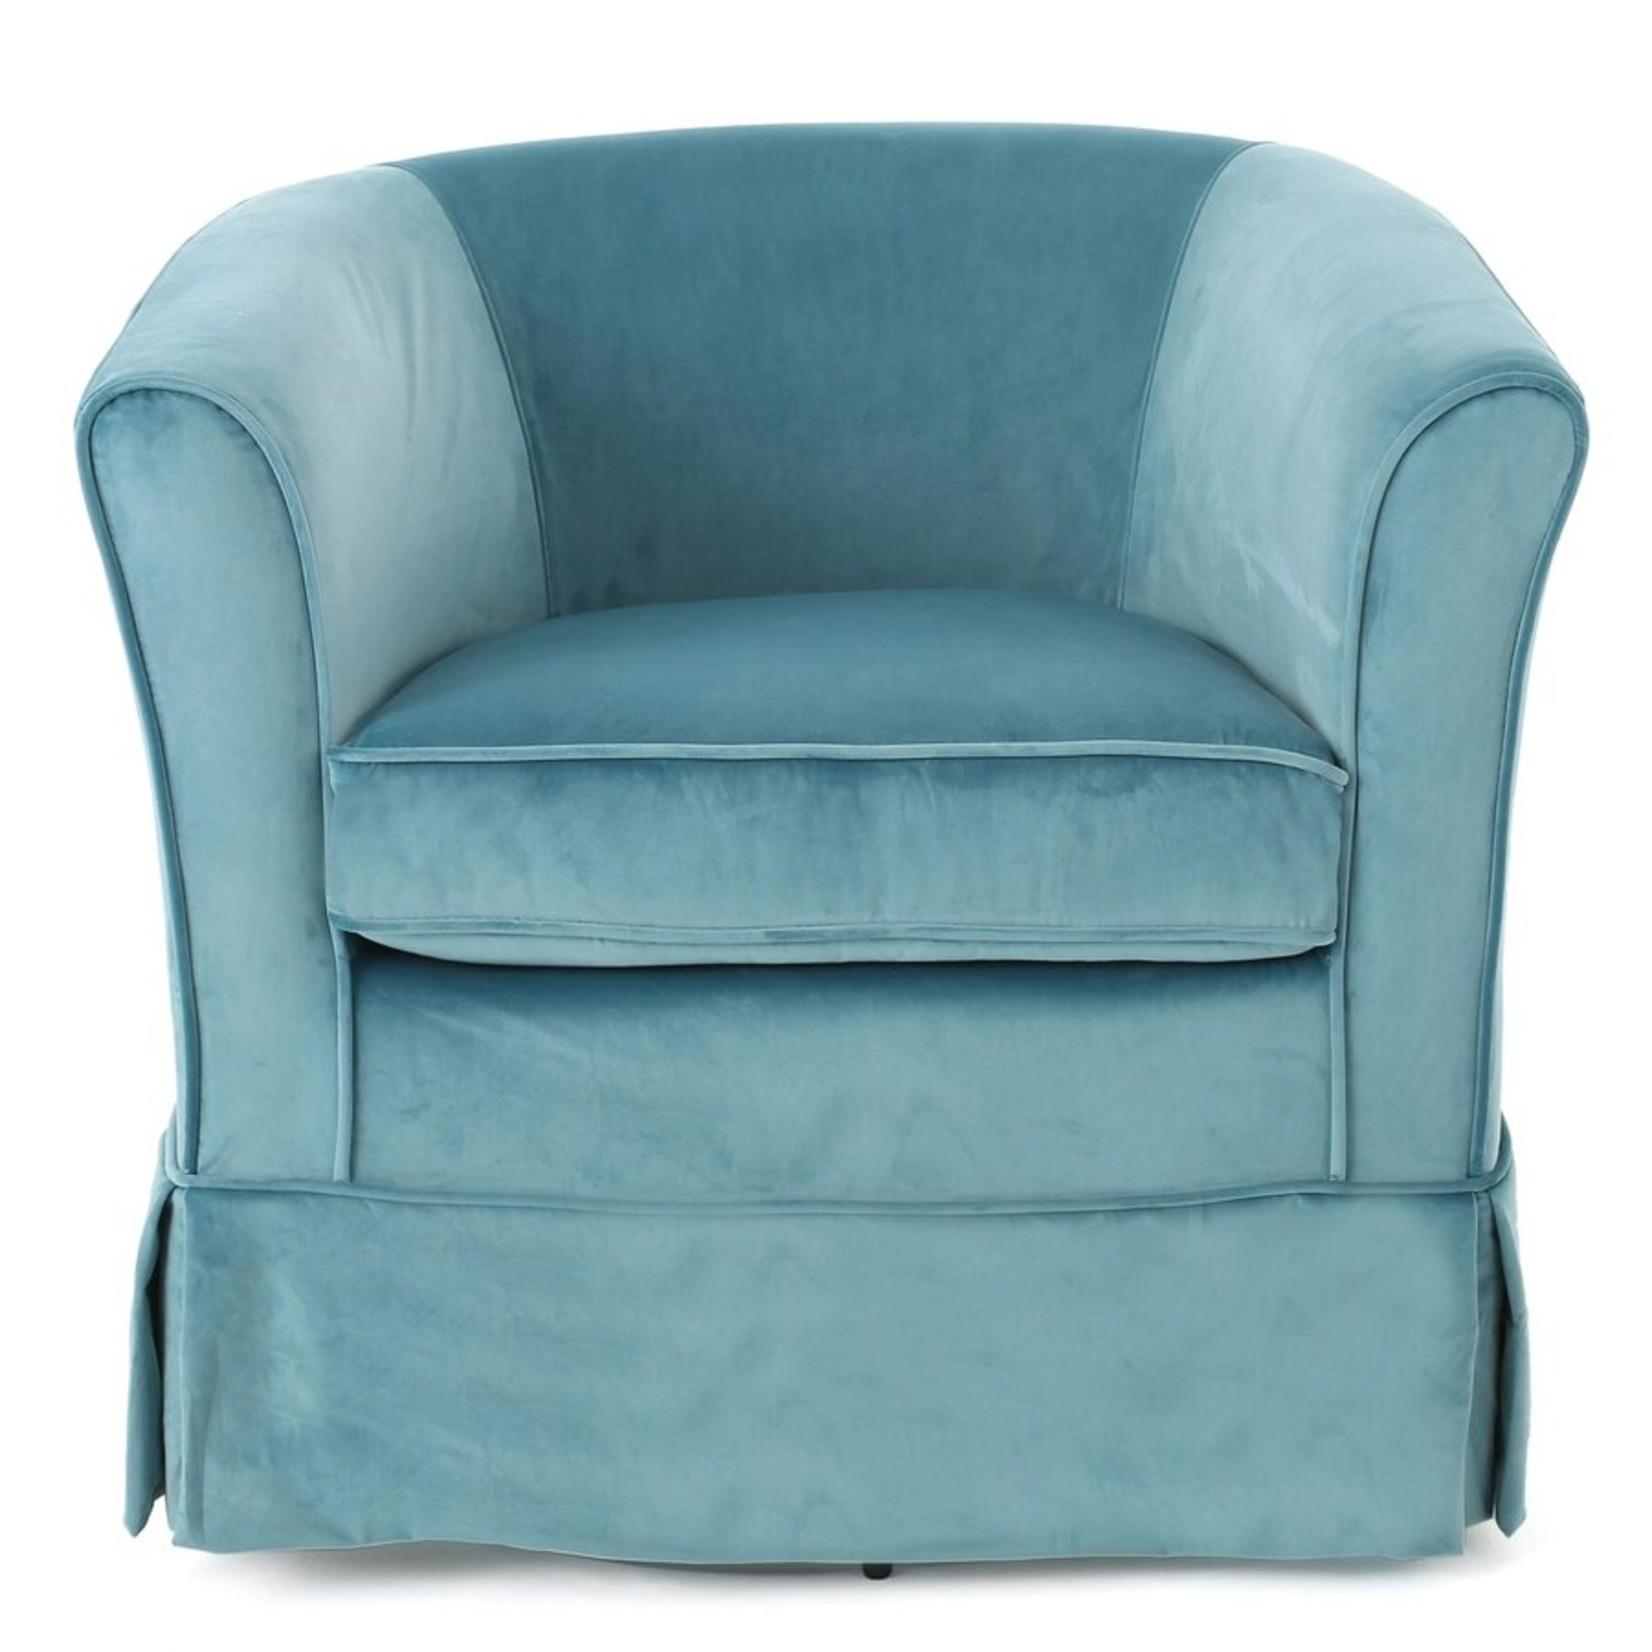 "*Aajaylah 27.5"" Wide Swivel Slipcovered Barrel Chair - Small Tear On Arm"